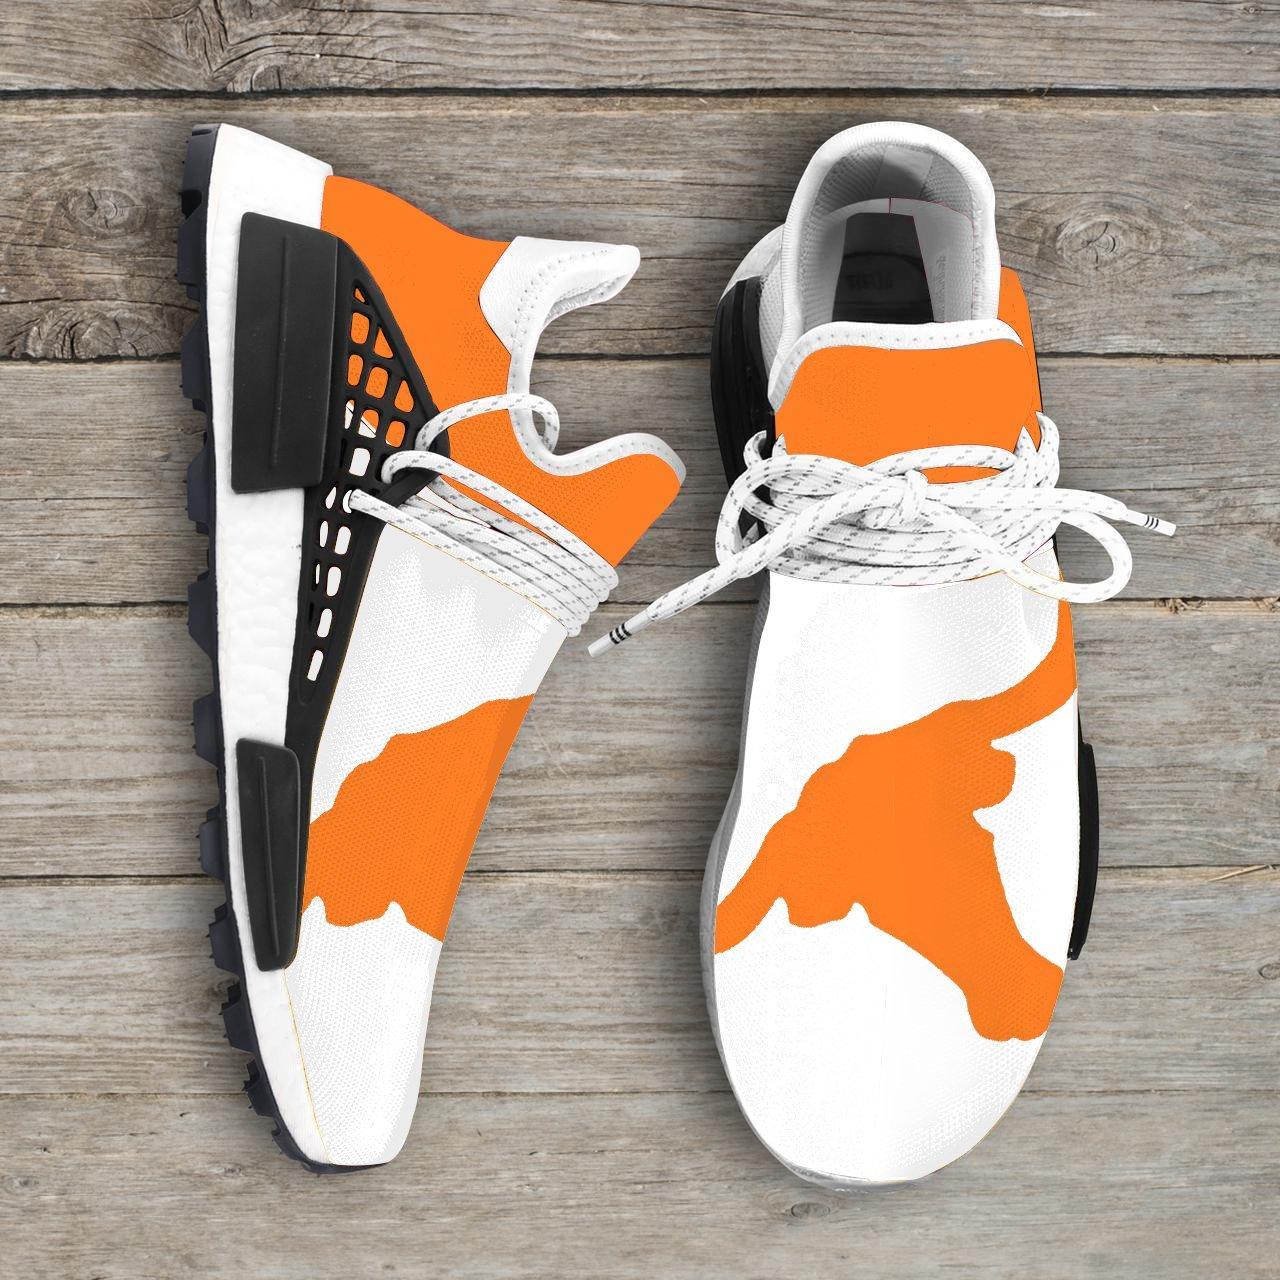 Texas Longhorns Ncaa NMD Human Shoes